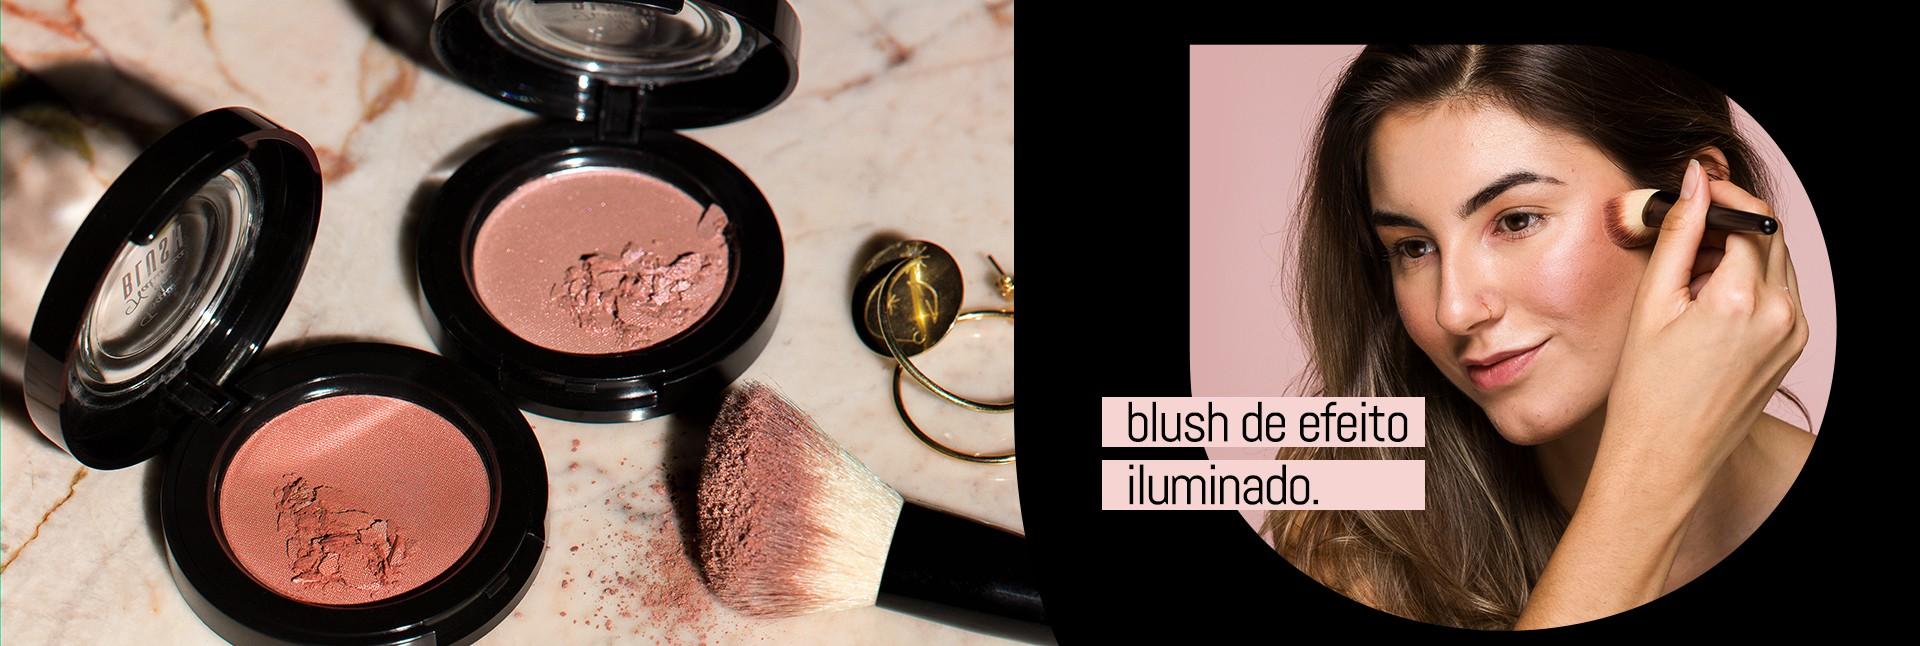 Blush Onix  - Efeito Iluminado